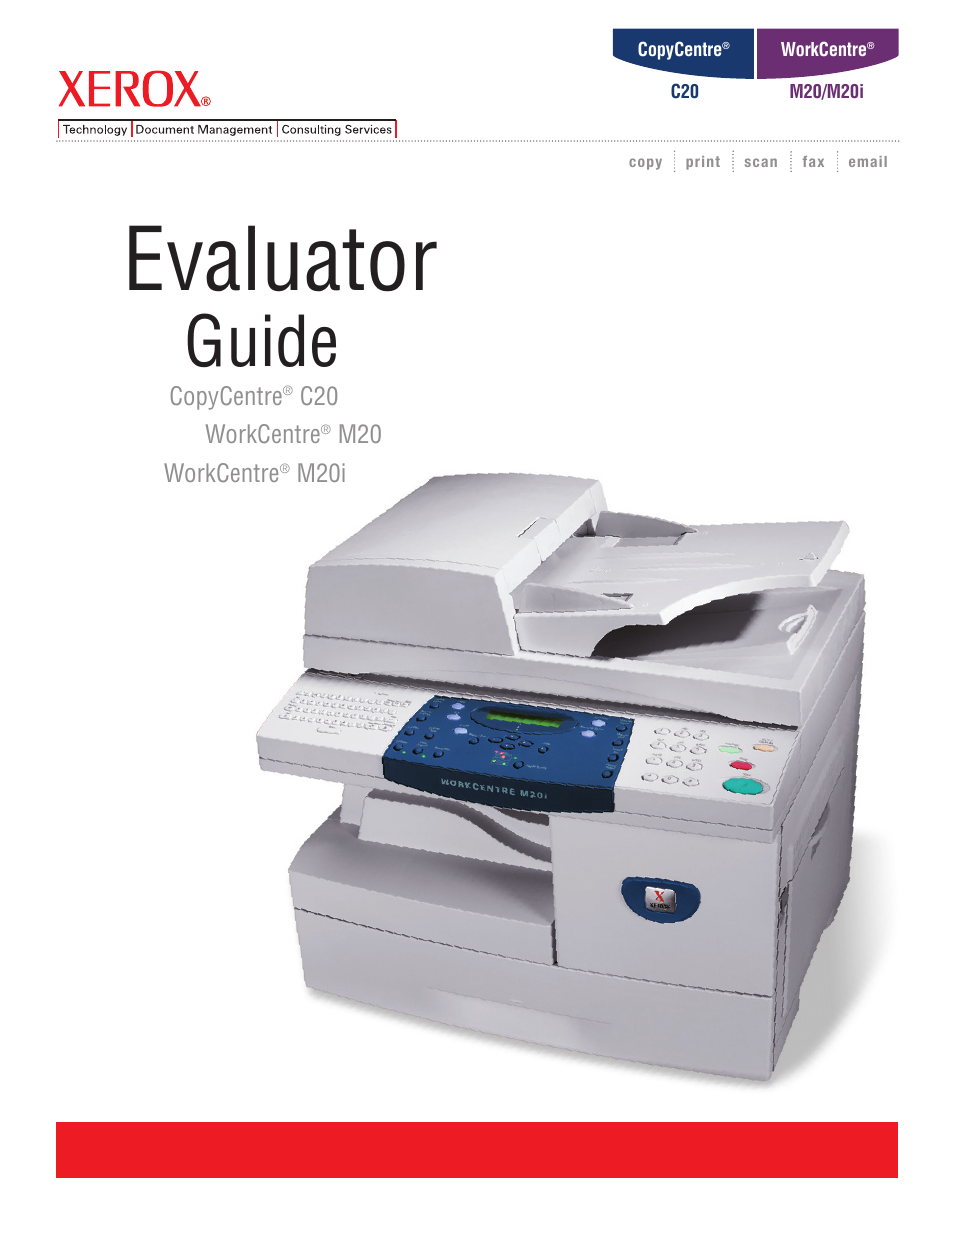 xerox c20 user manual 16 pages rh manualsdir com xerox m20i service manual pdf xerox workcentre m20i manual pdf